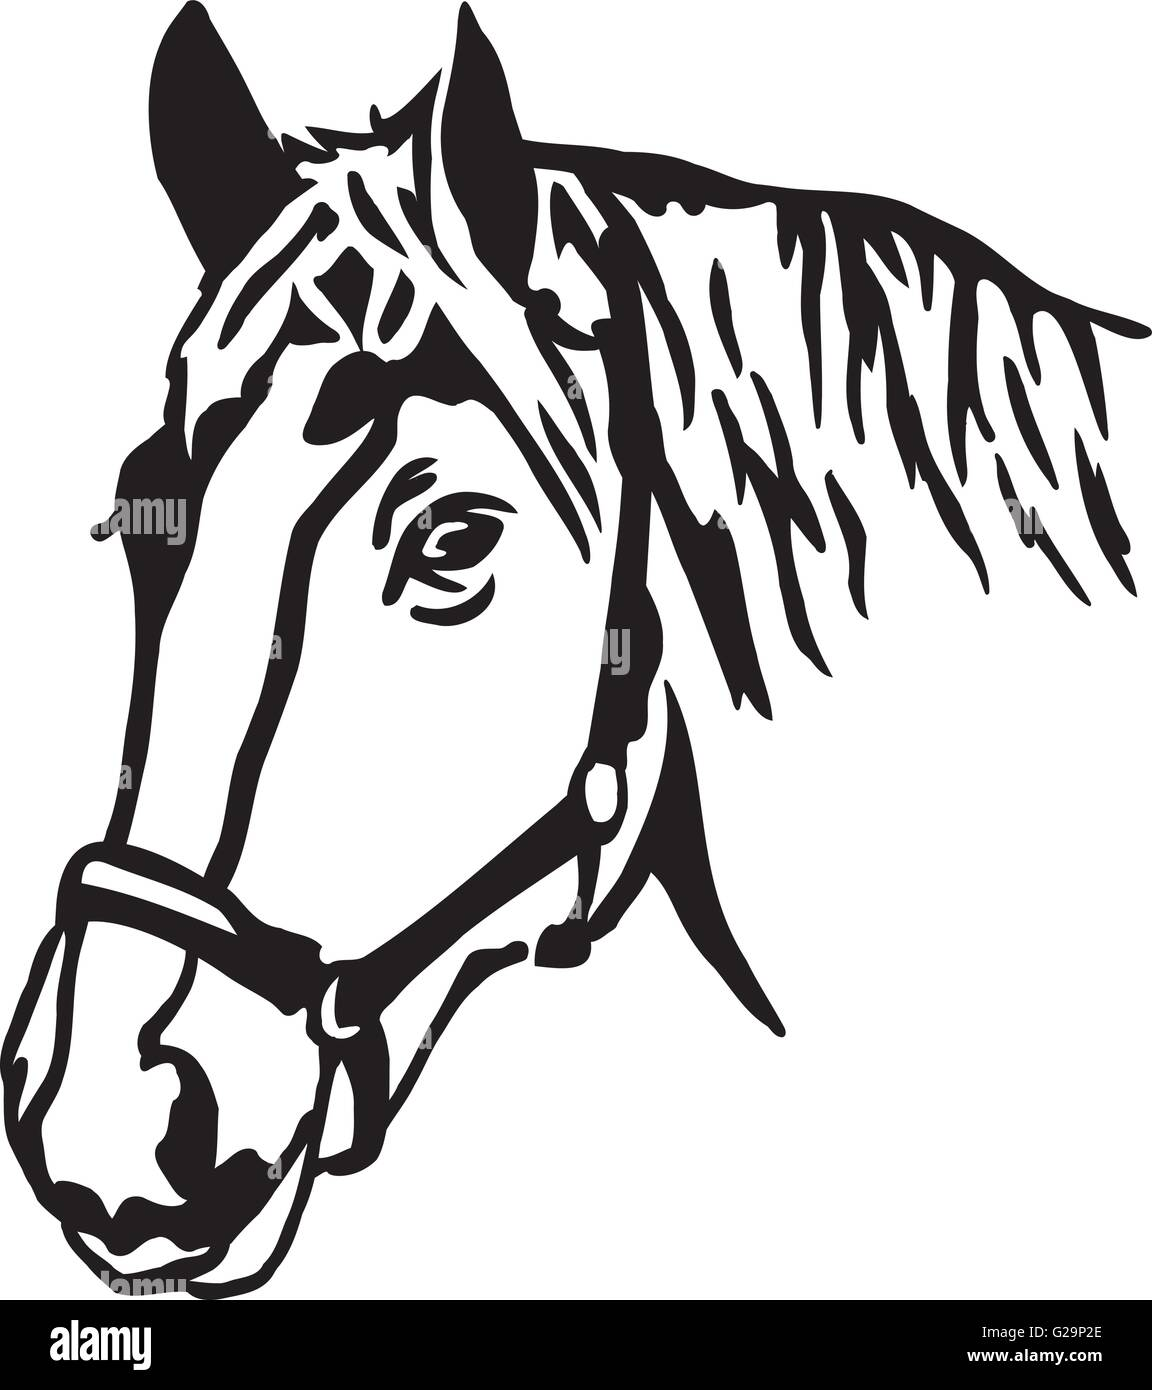 real horse head vector stock vector art illustration vector image rh alamy com horse head vector black and white horse head vector black and white